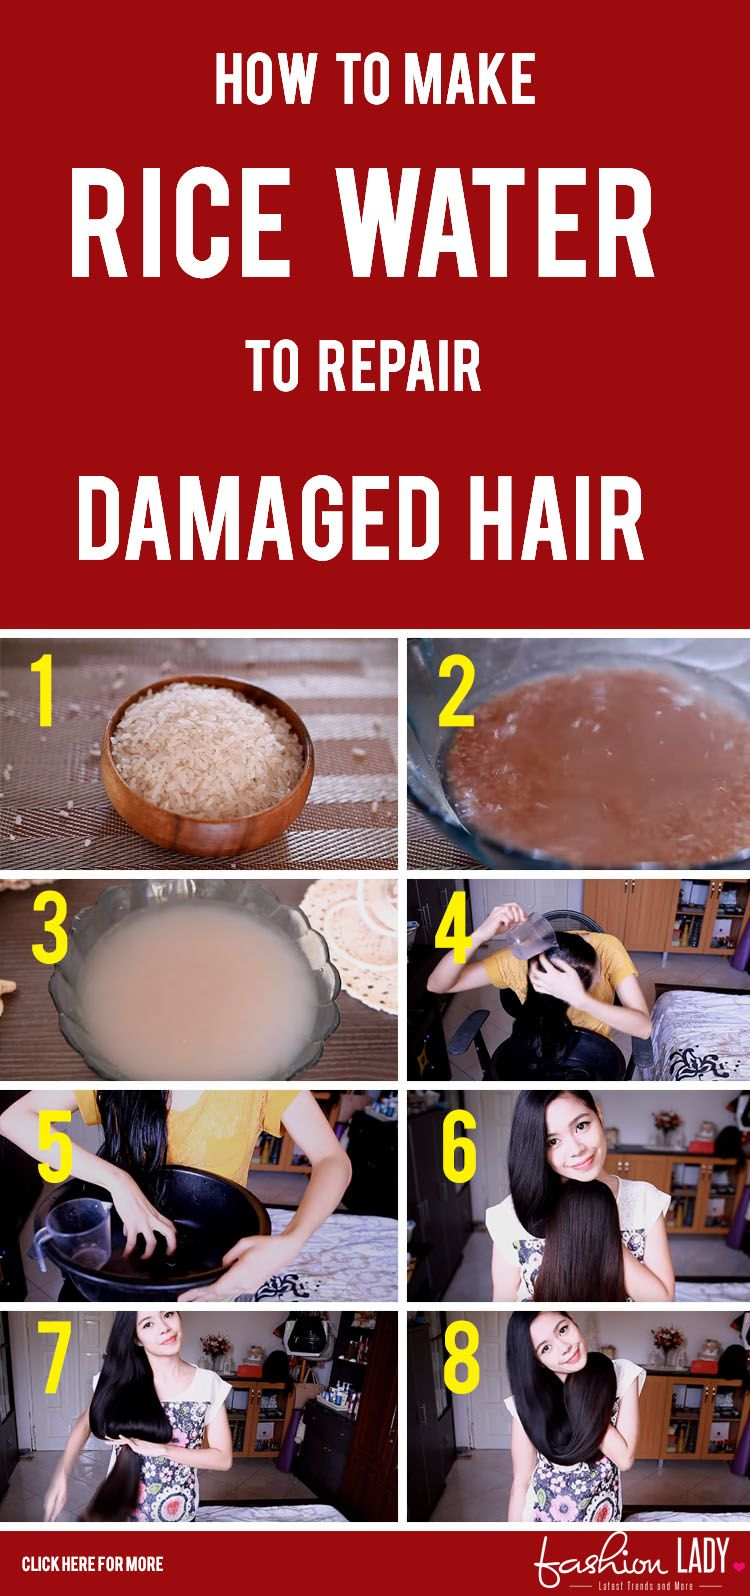 How To Make Rice Water To Repair Damaged Hair Damaged Hair Repair Damaged Hair Damaged Hair Repair Diy